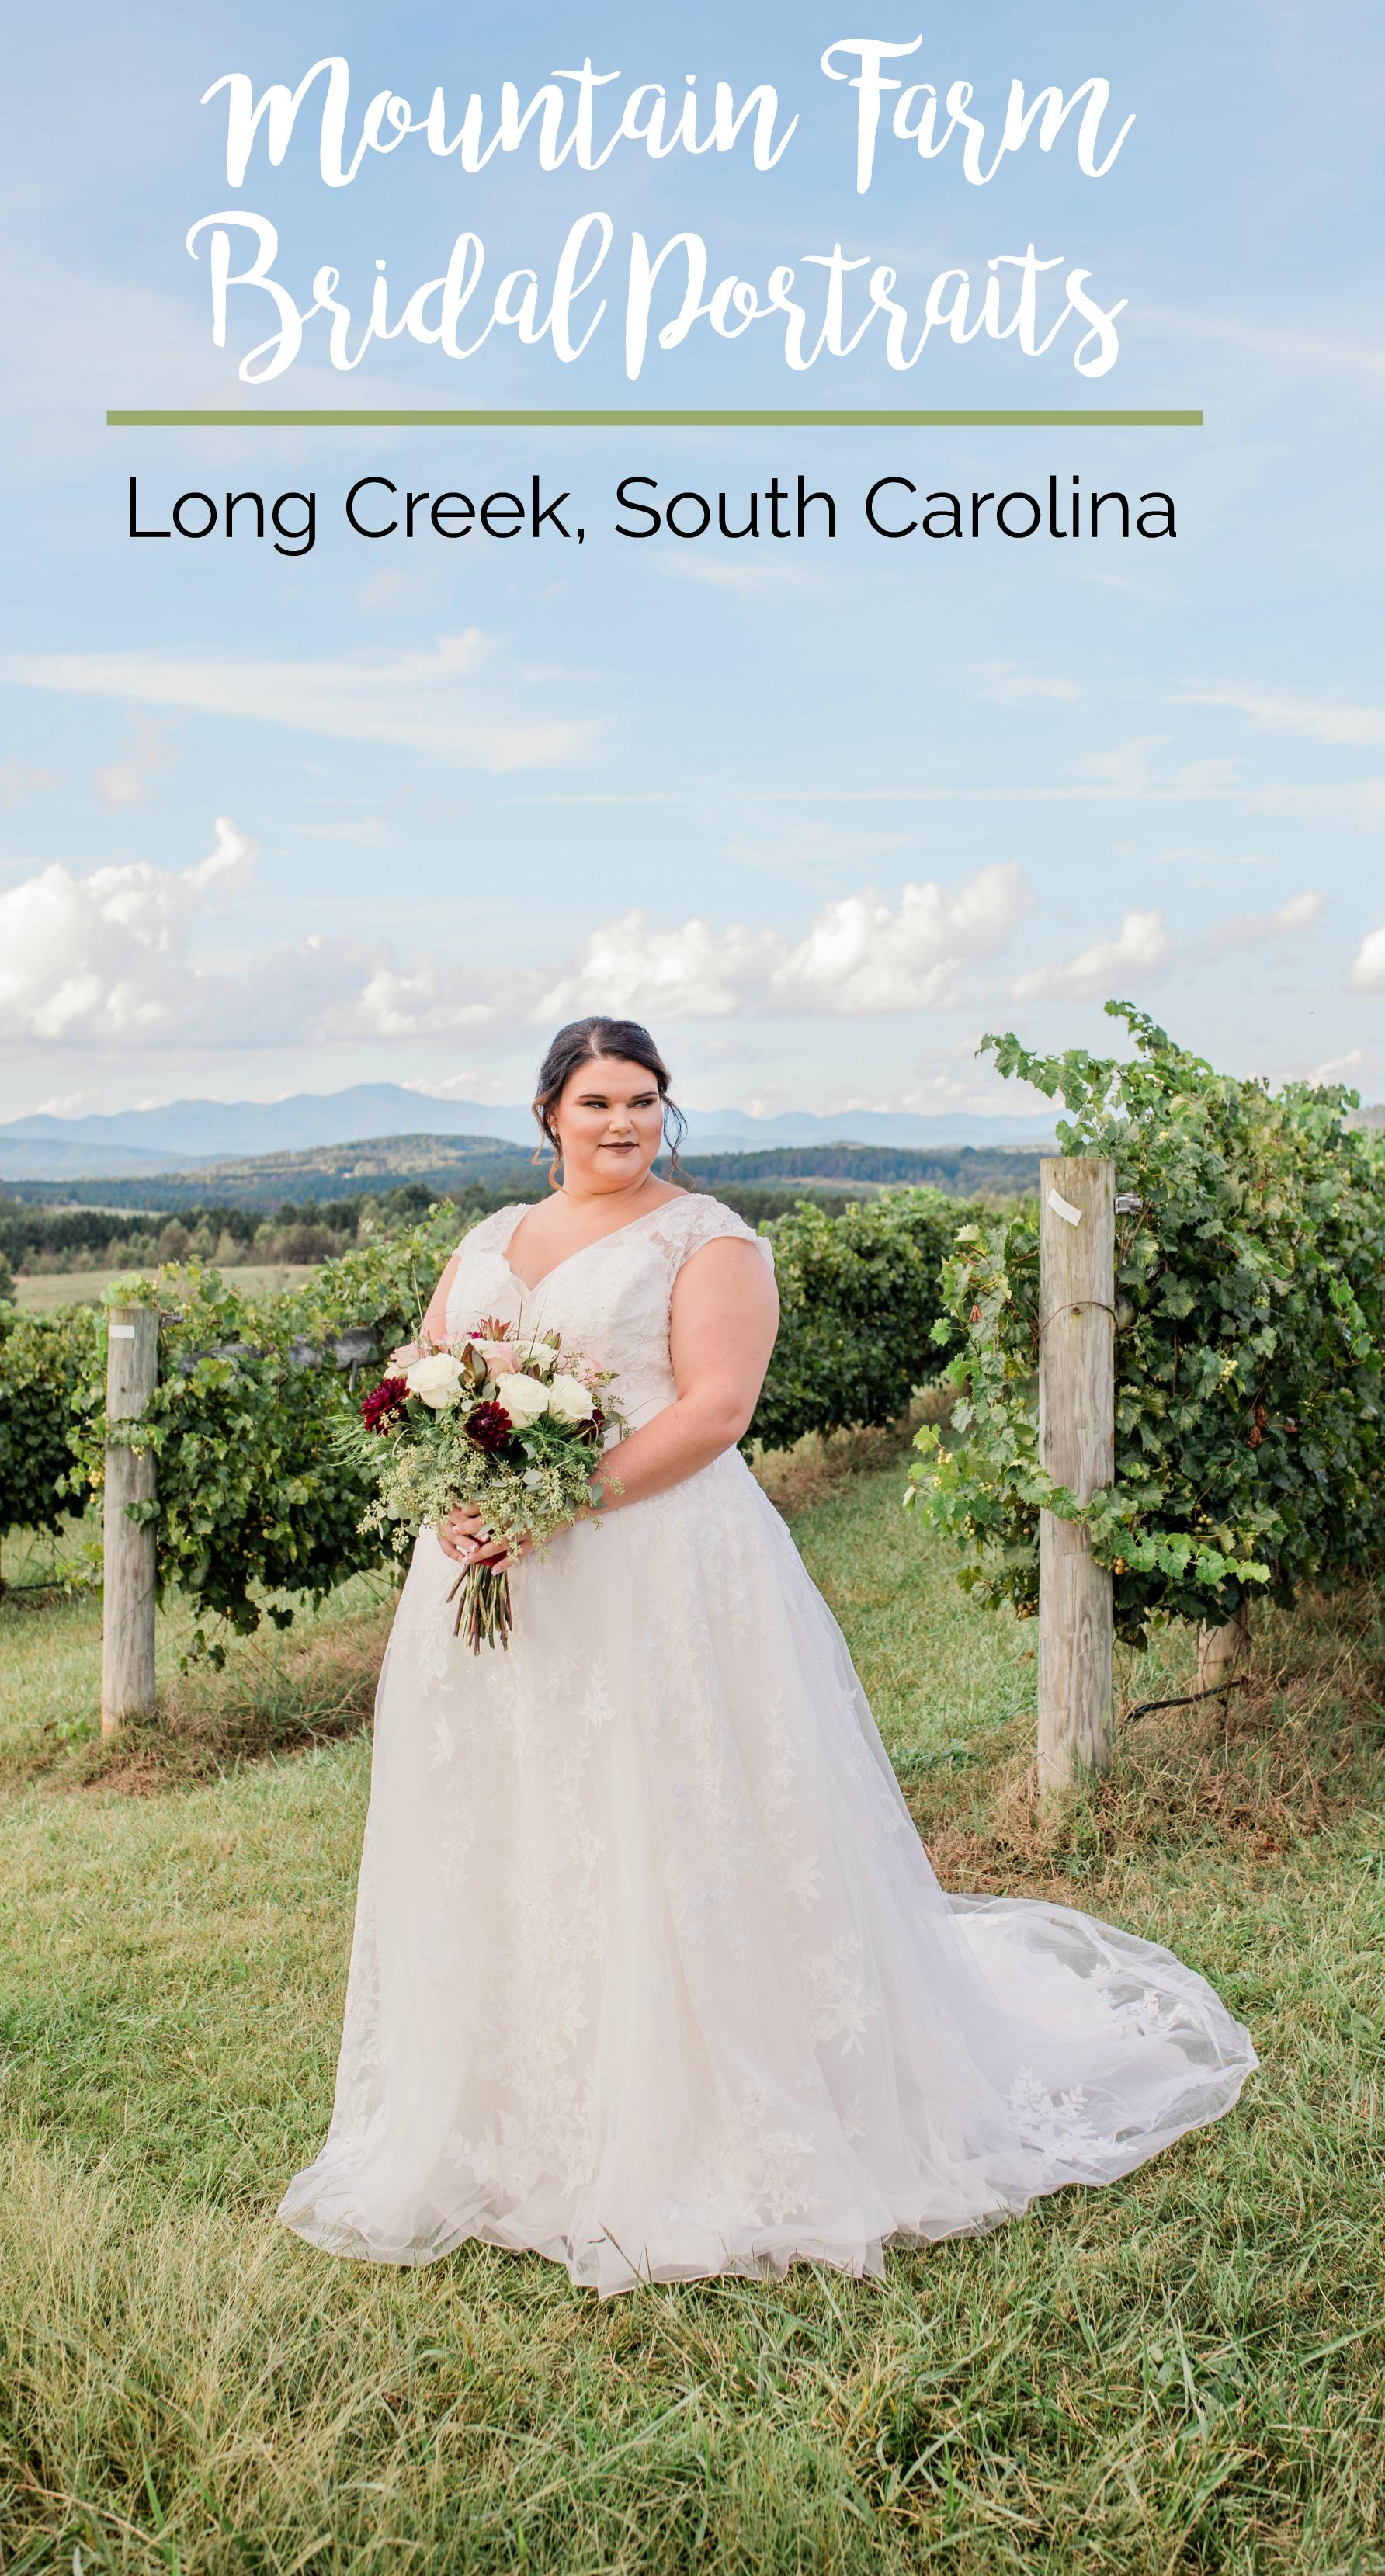 Brandi's Bridal Portraits at Chattooga Belle Farm, Long Creek, South Carolina | Palmetto State Weddings | CH Photography | Greenville SC wedding | bridal portrait inspiration | mountain wedding